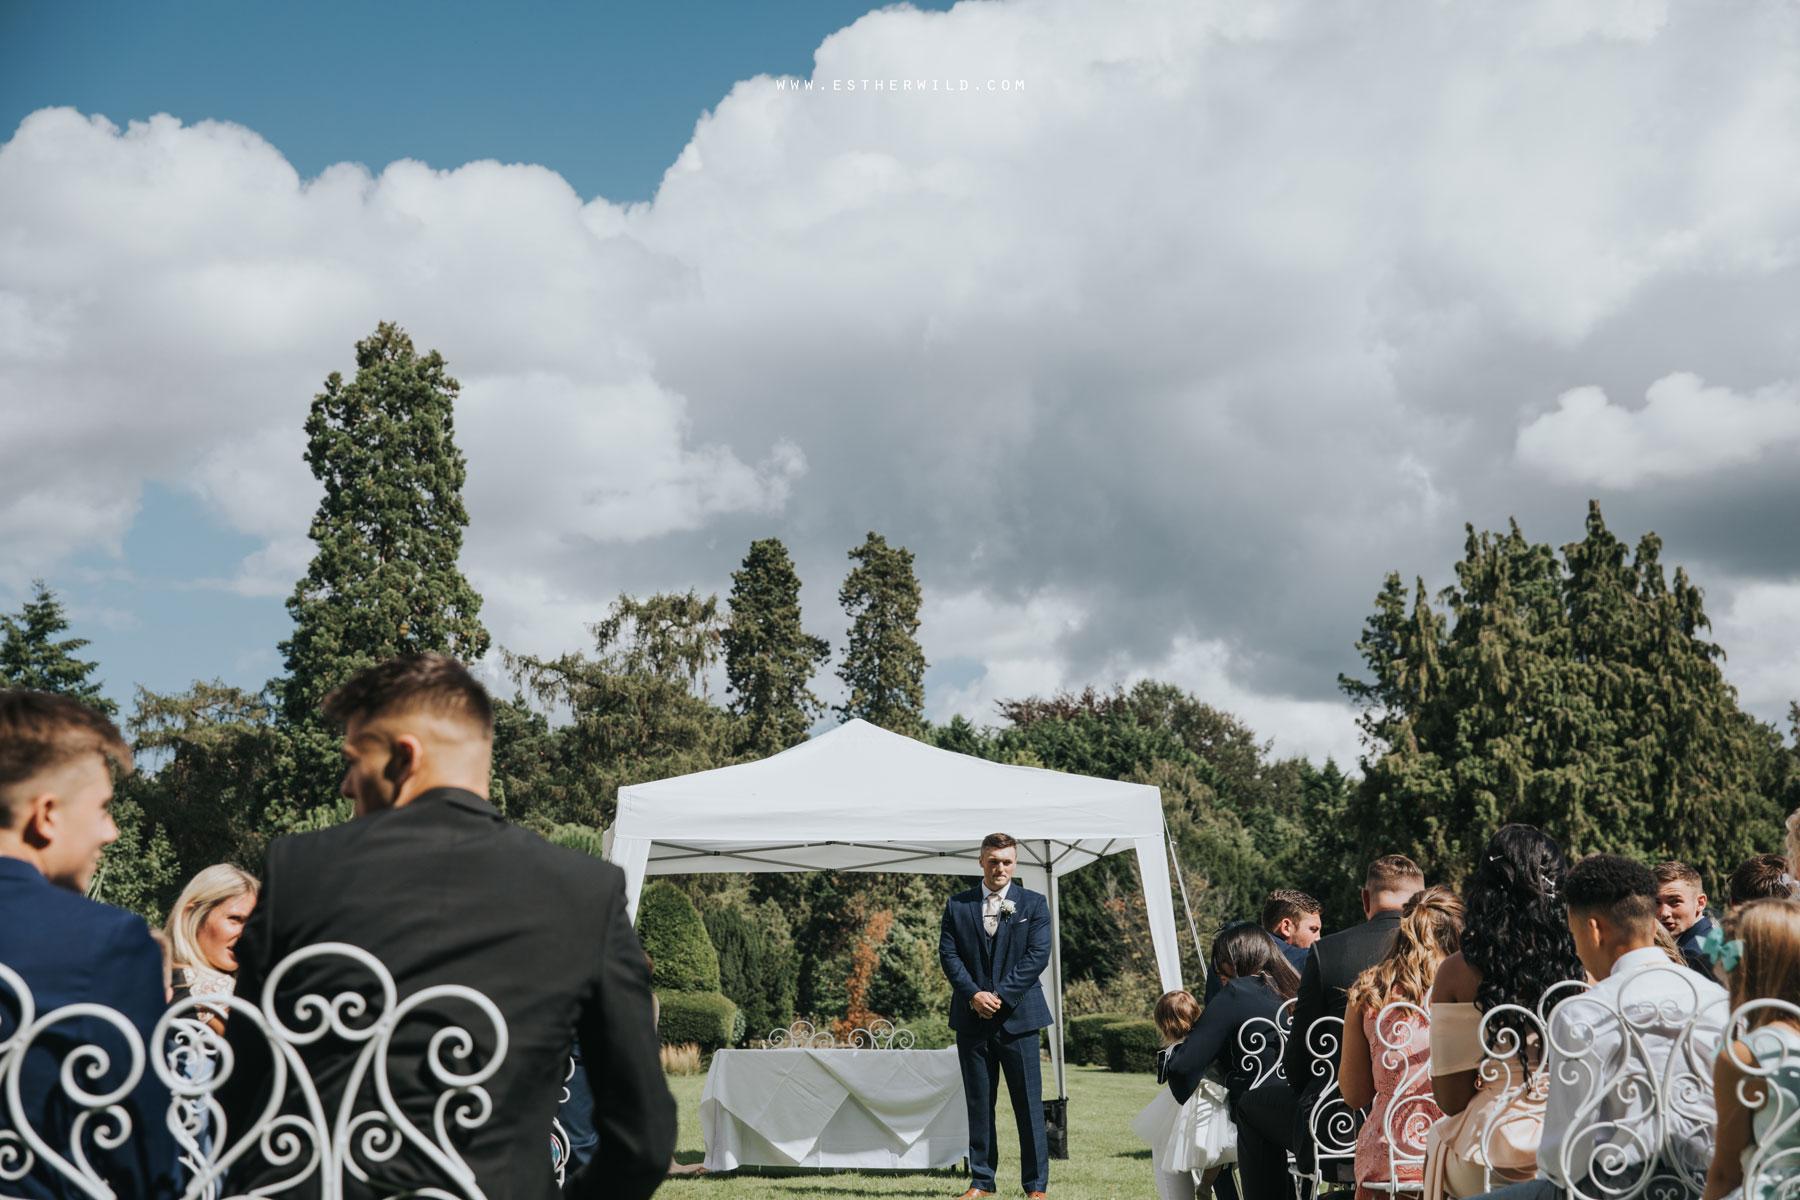 Lynford_Hall_Wedding_Thetford_Mundford_Esther_Wild_Photographer_IMG_1144.jpg